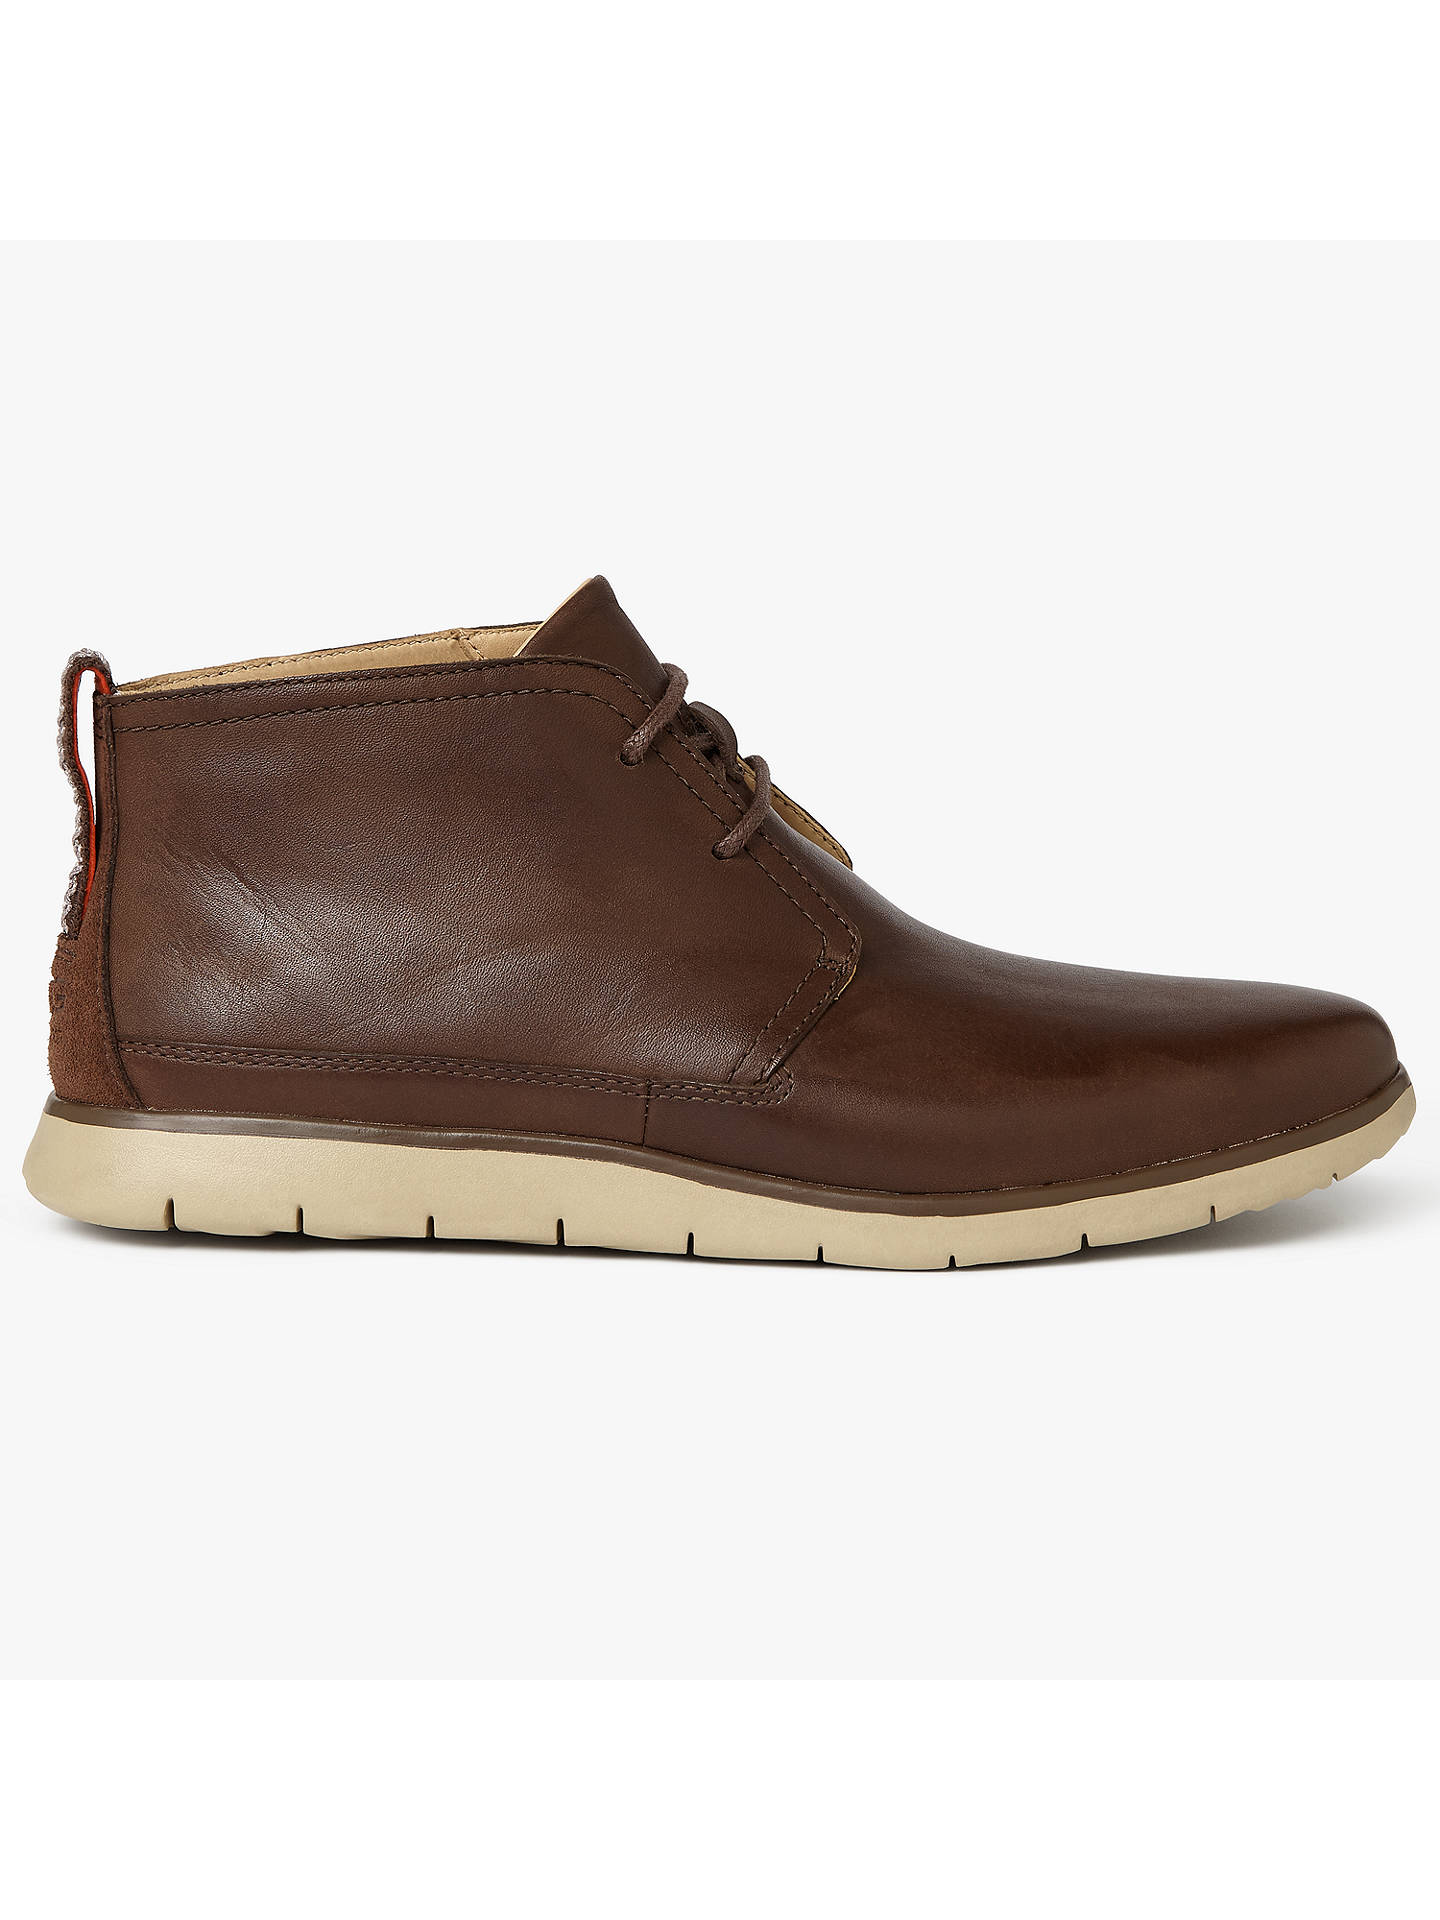 cda68223e44 UGG Freeman Waterproof Leather Boots, Brown at John Lewis & Partners